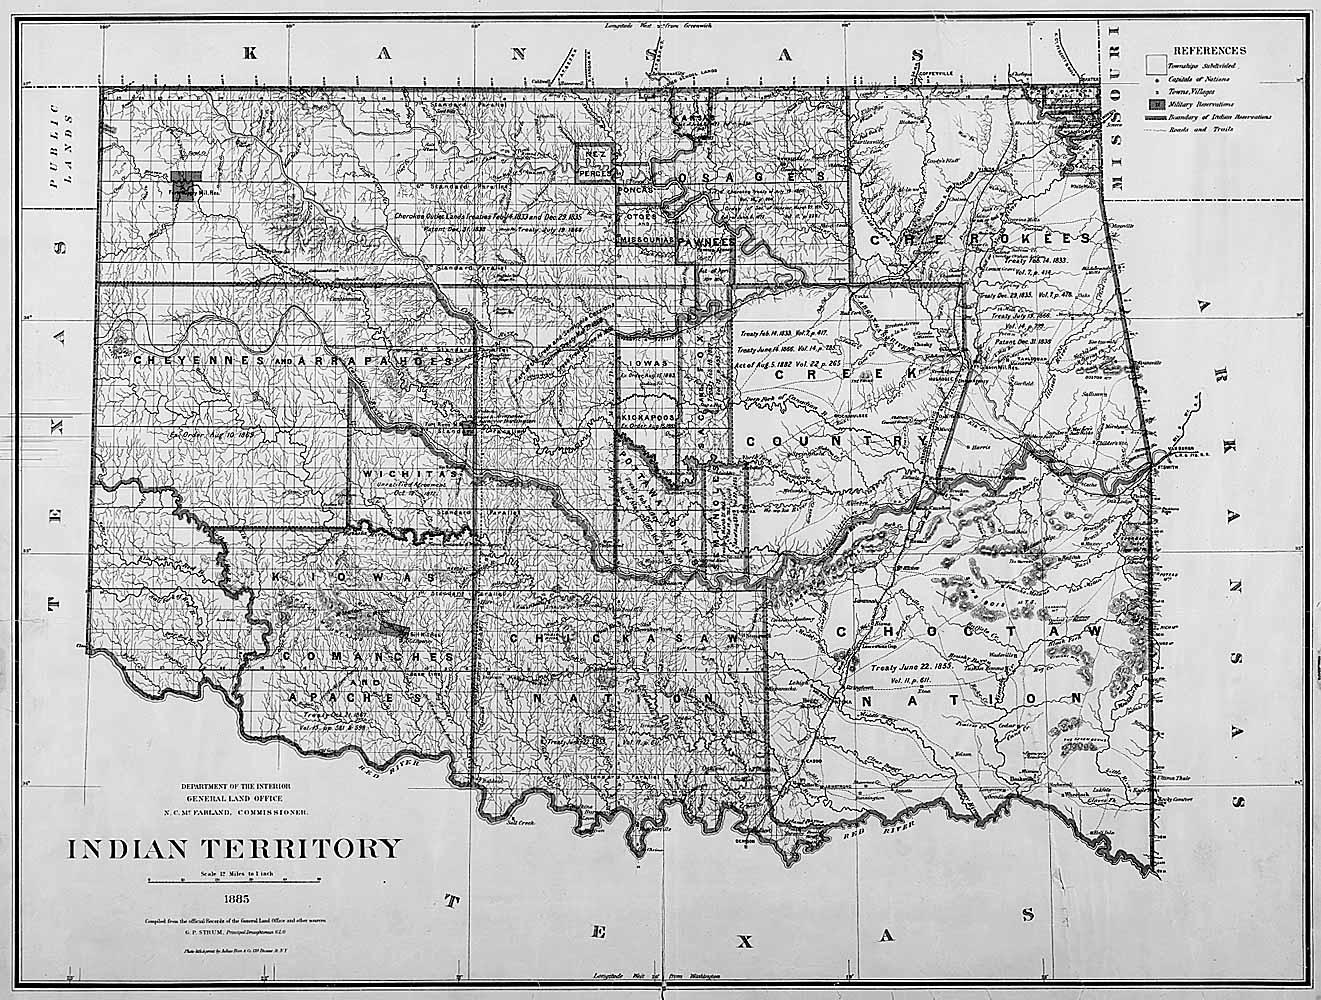 IndianTerritory-map-011885-1.jpg